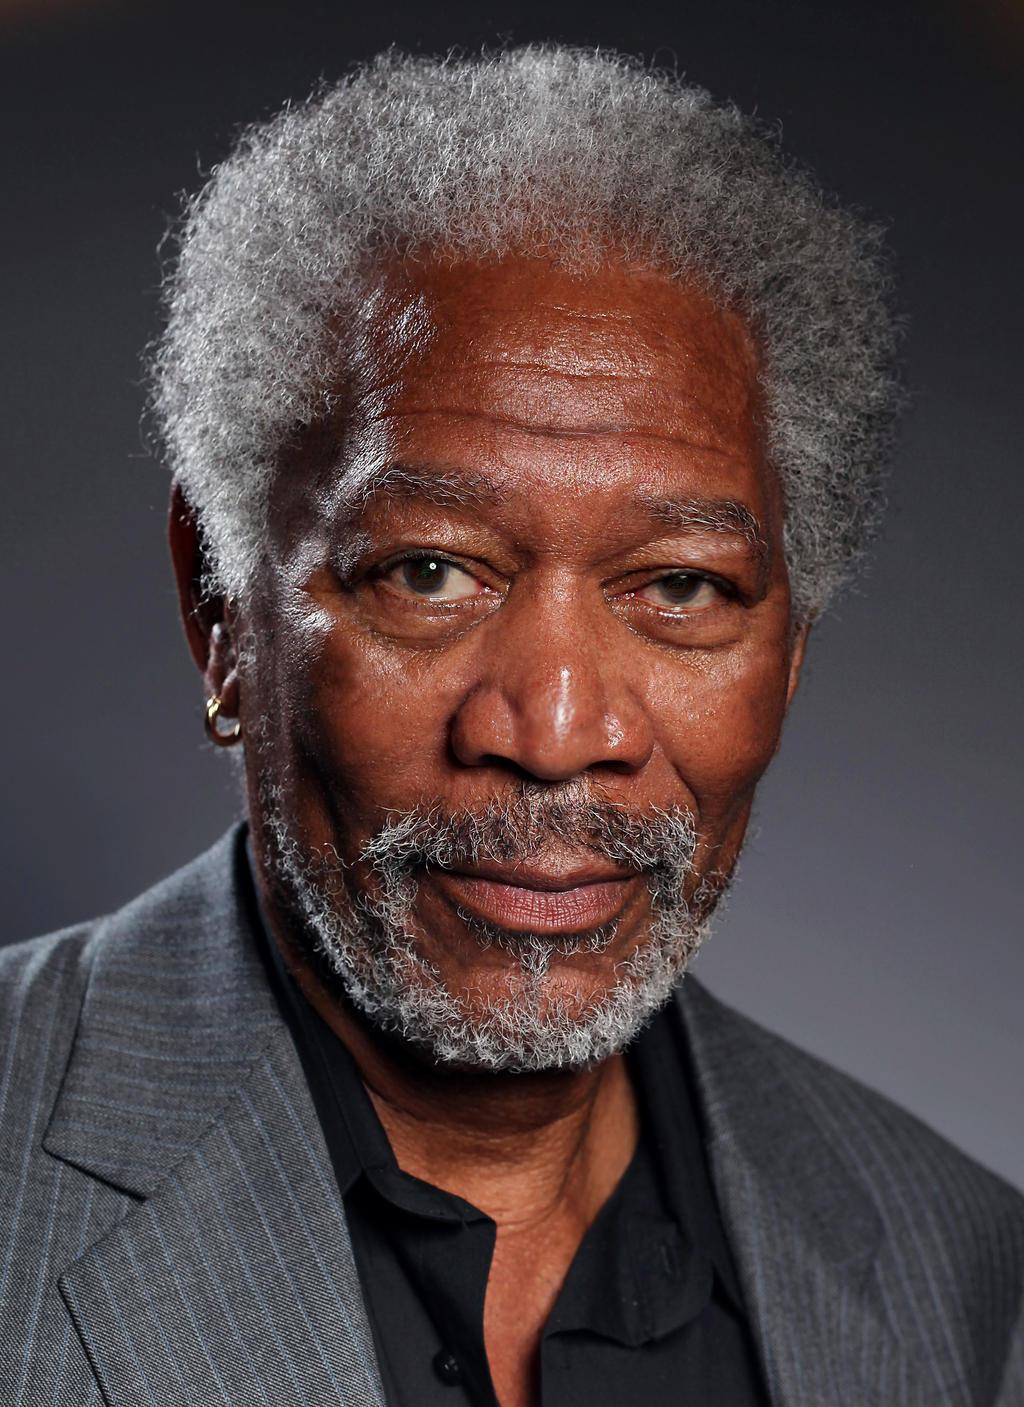 Morgan Freeman Edit by brurdi10